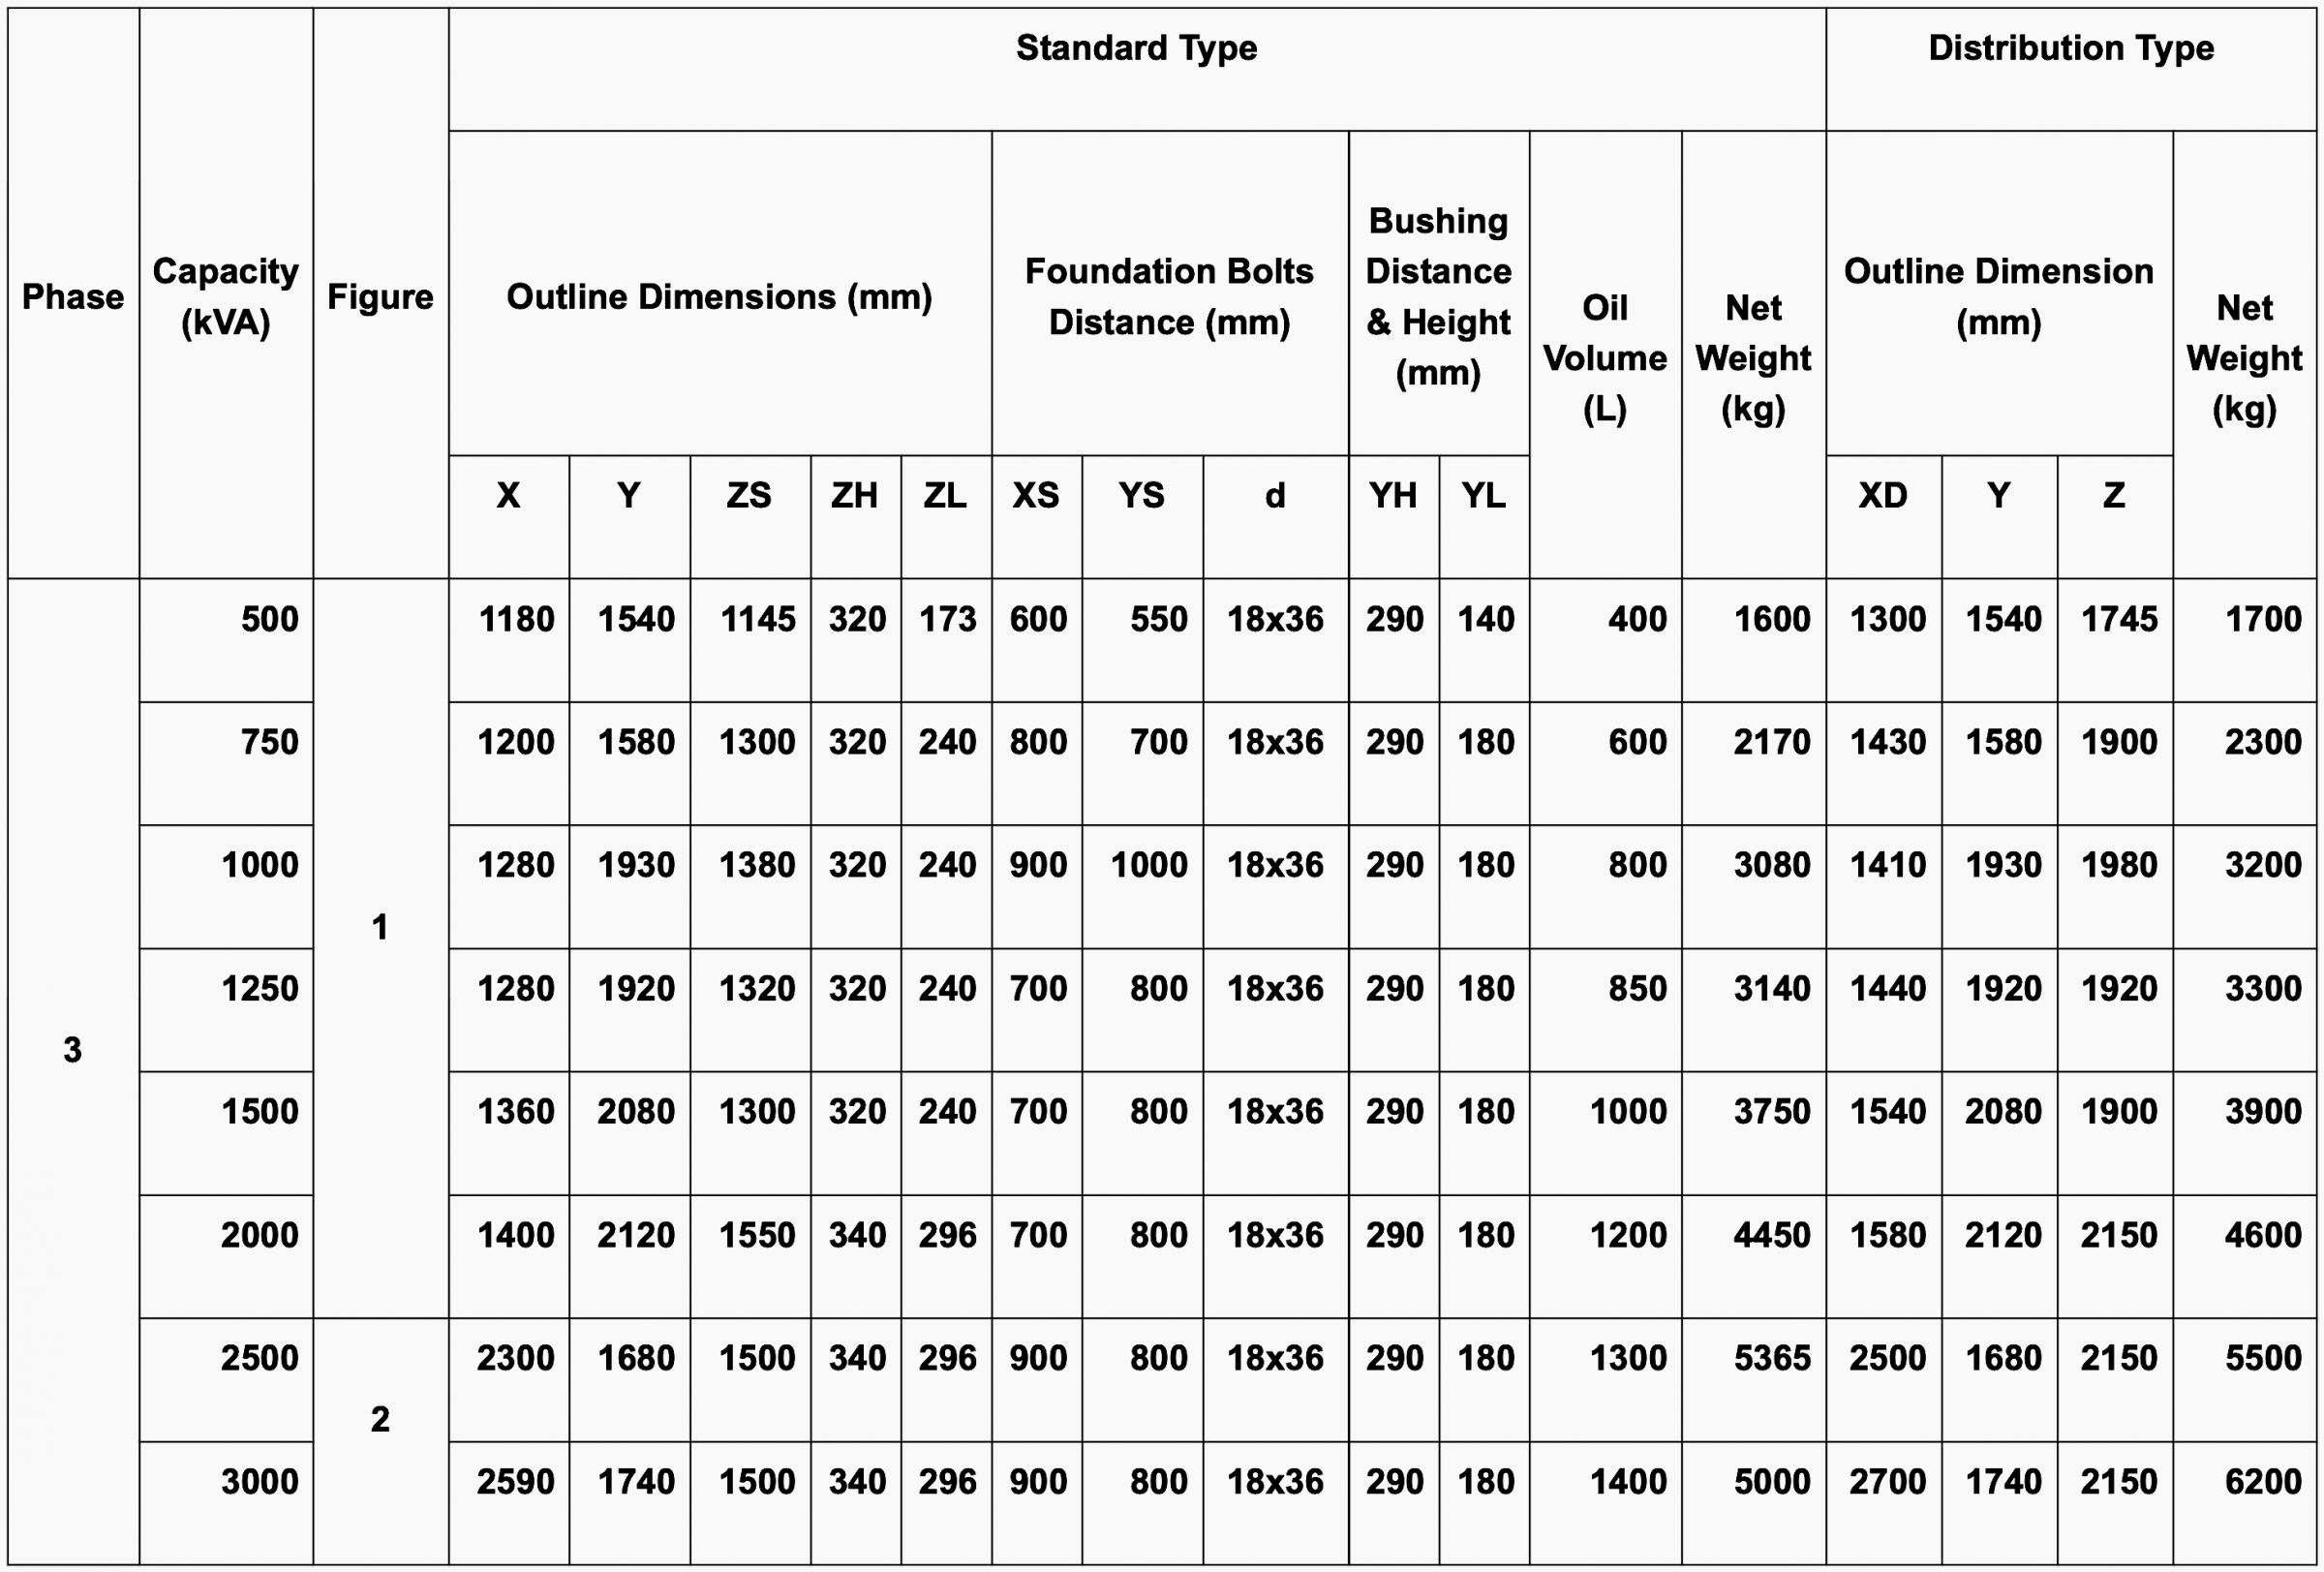 Medium-Voltage Oil-Immersed Transformers (500—3000 kVA) High